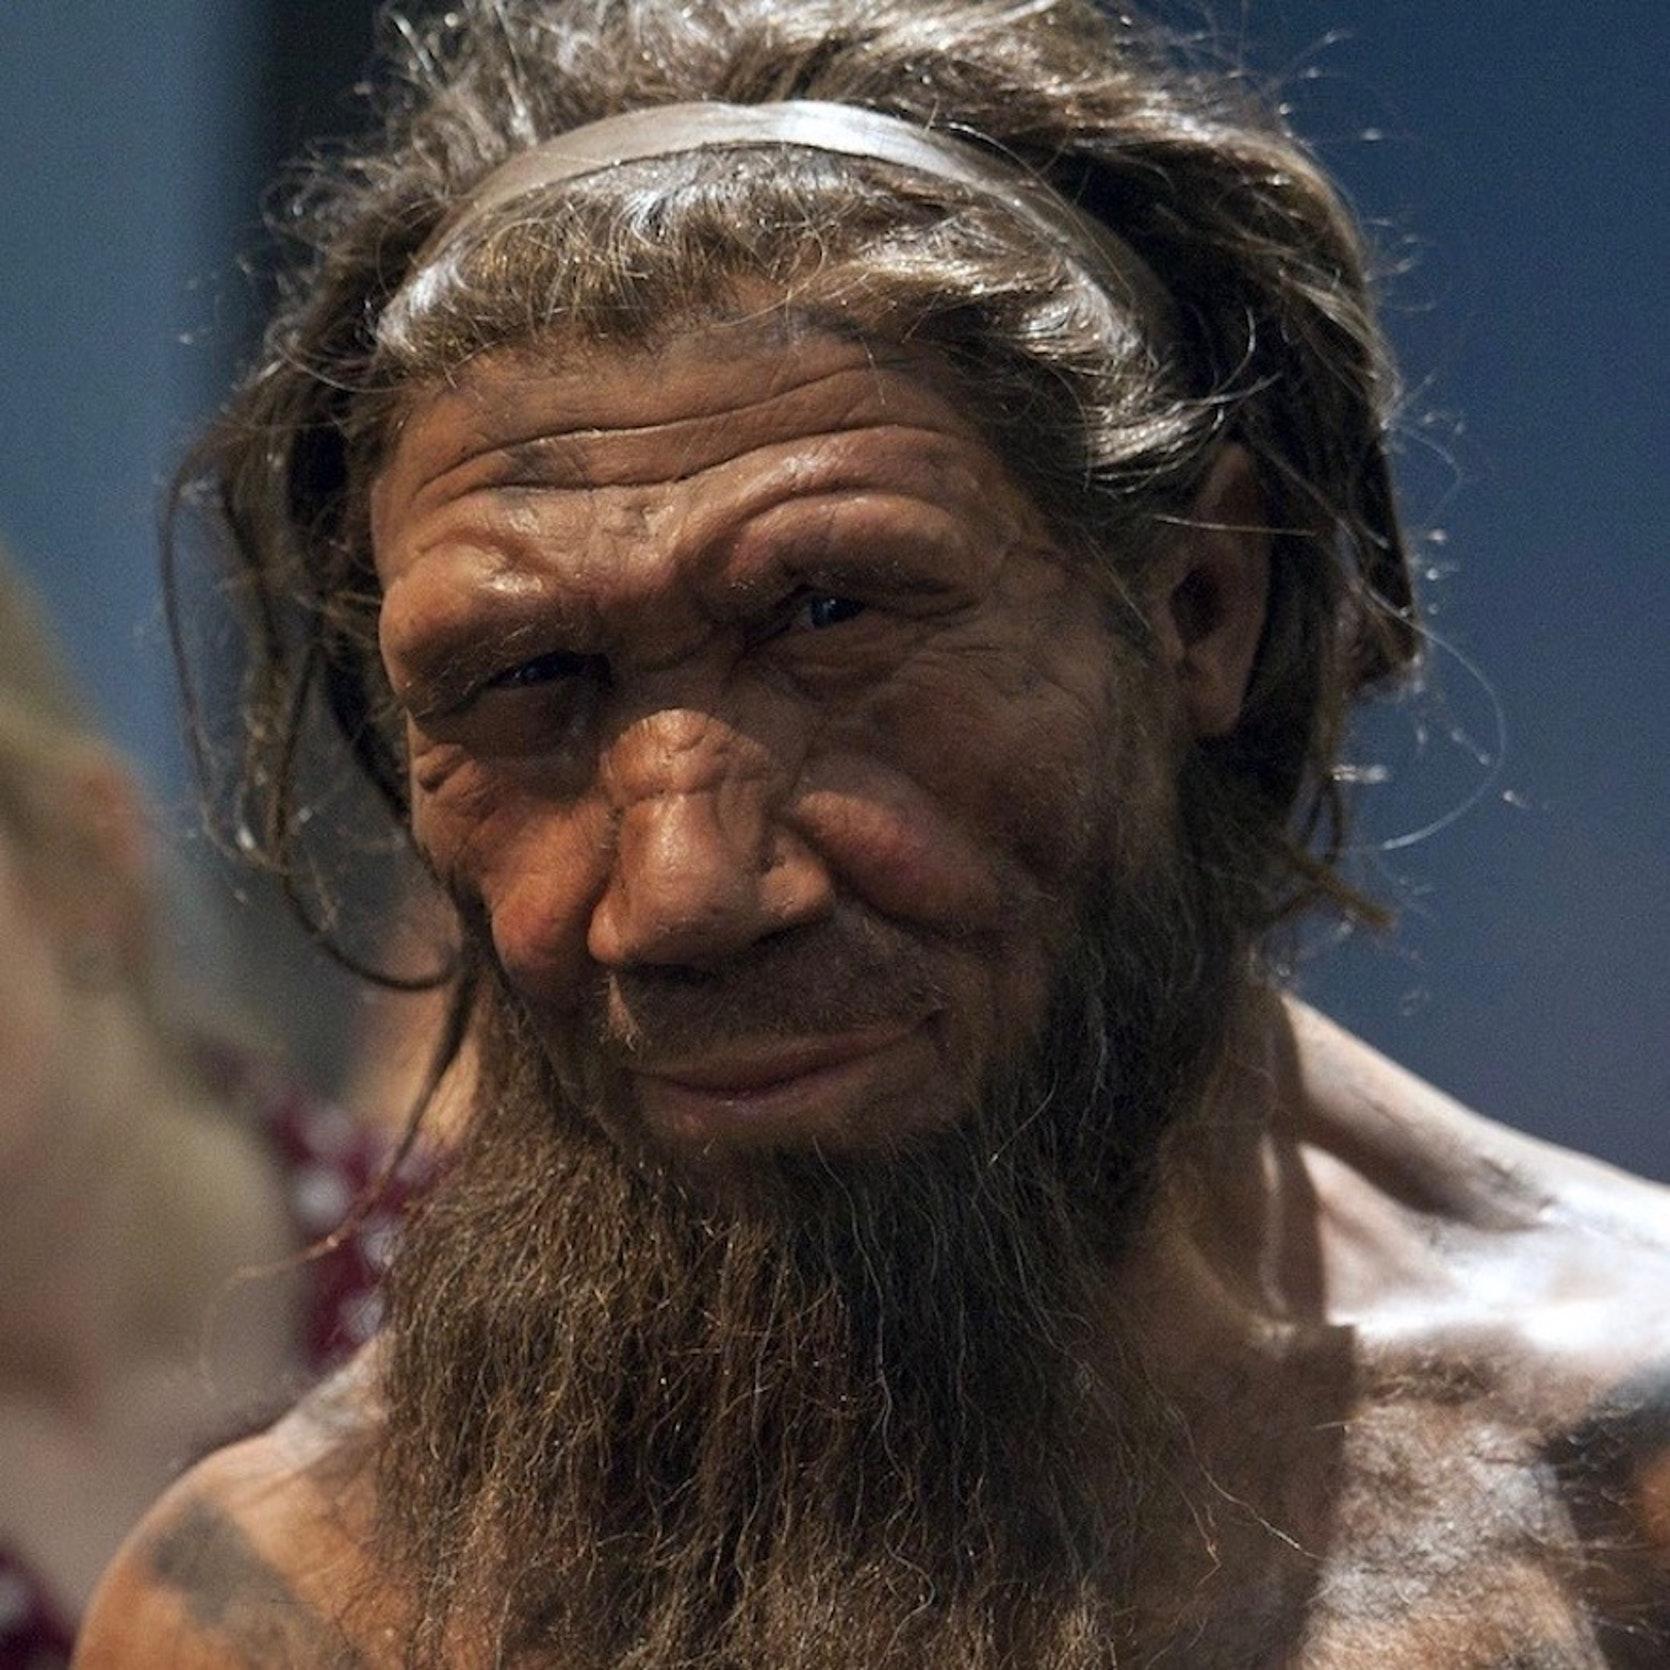 Neanderthal Hearths in Spain Analyzed